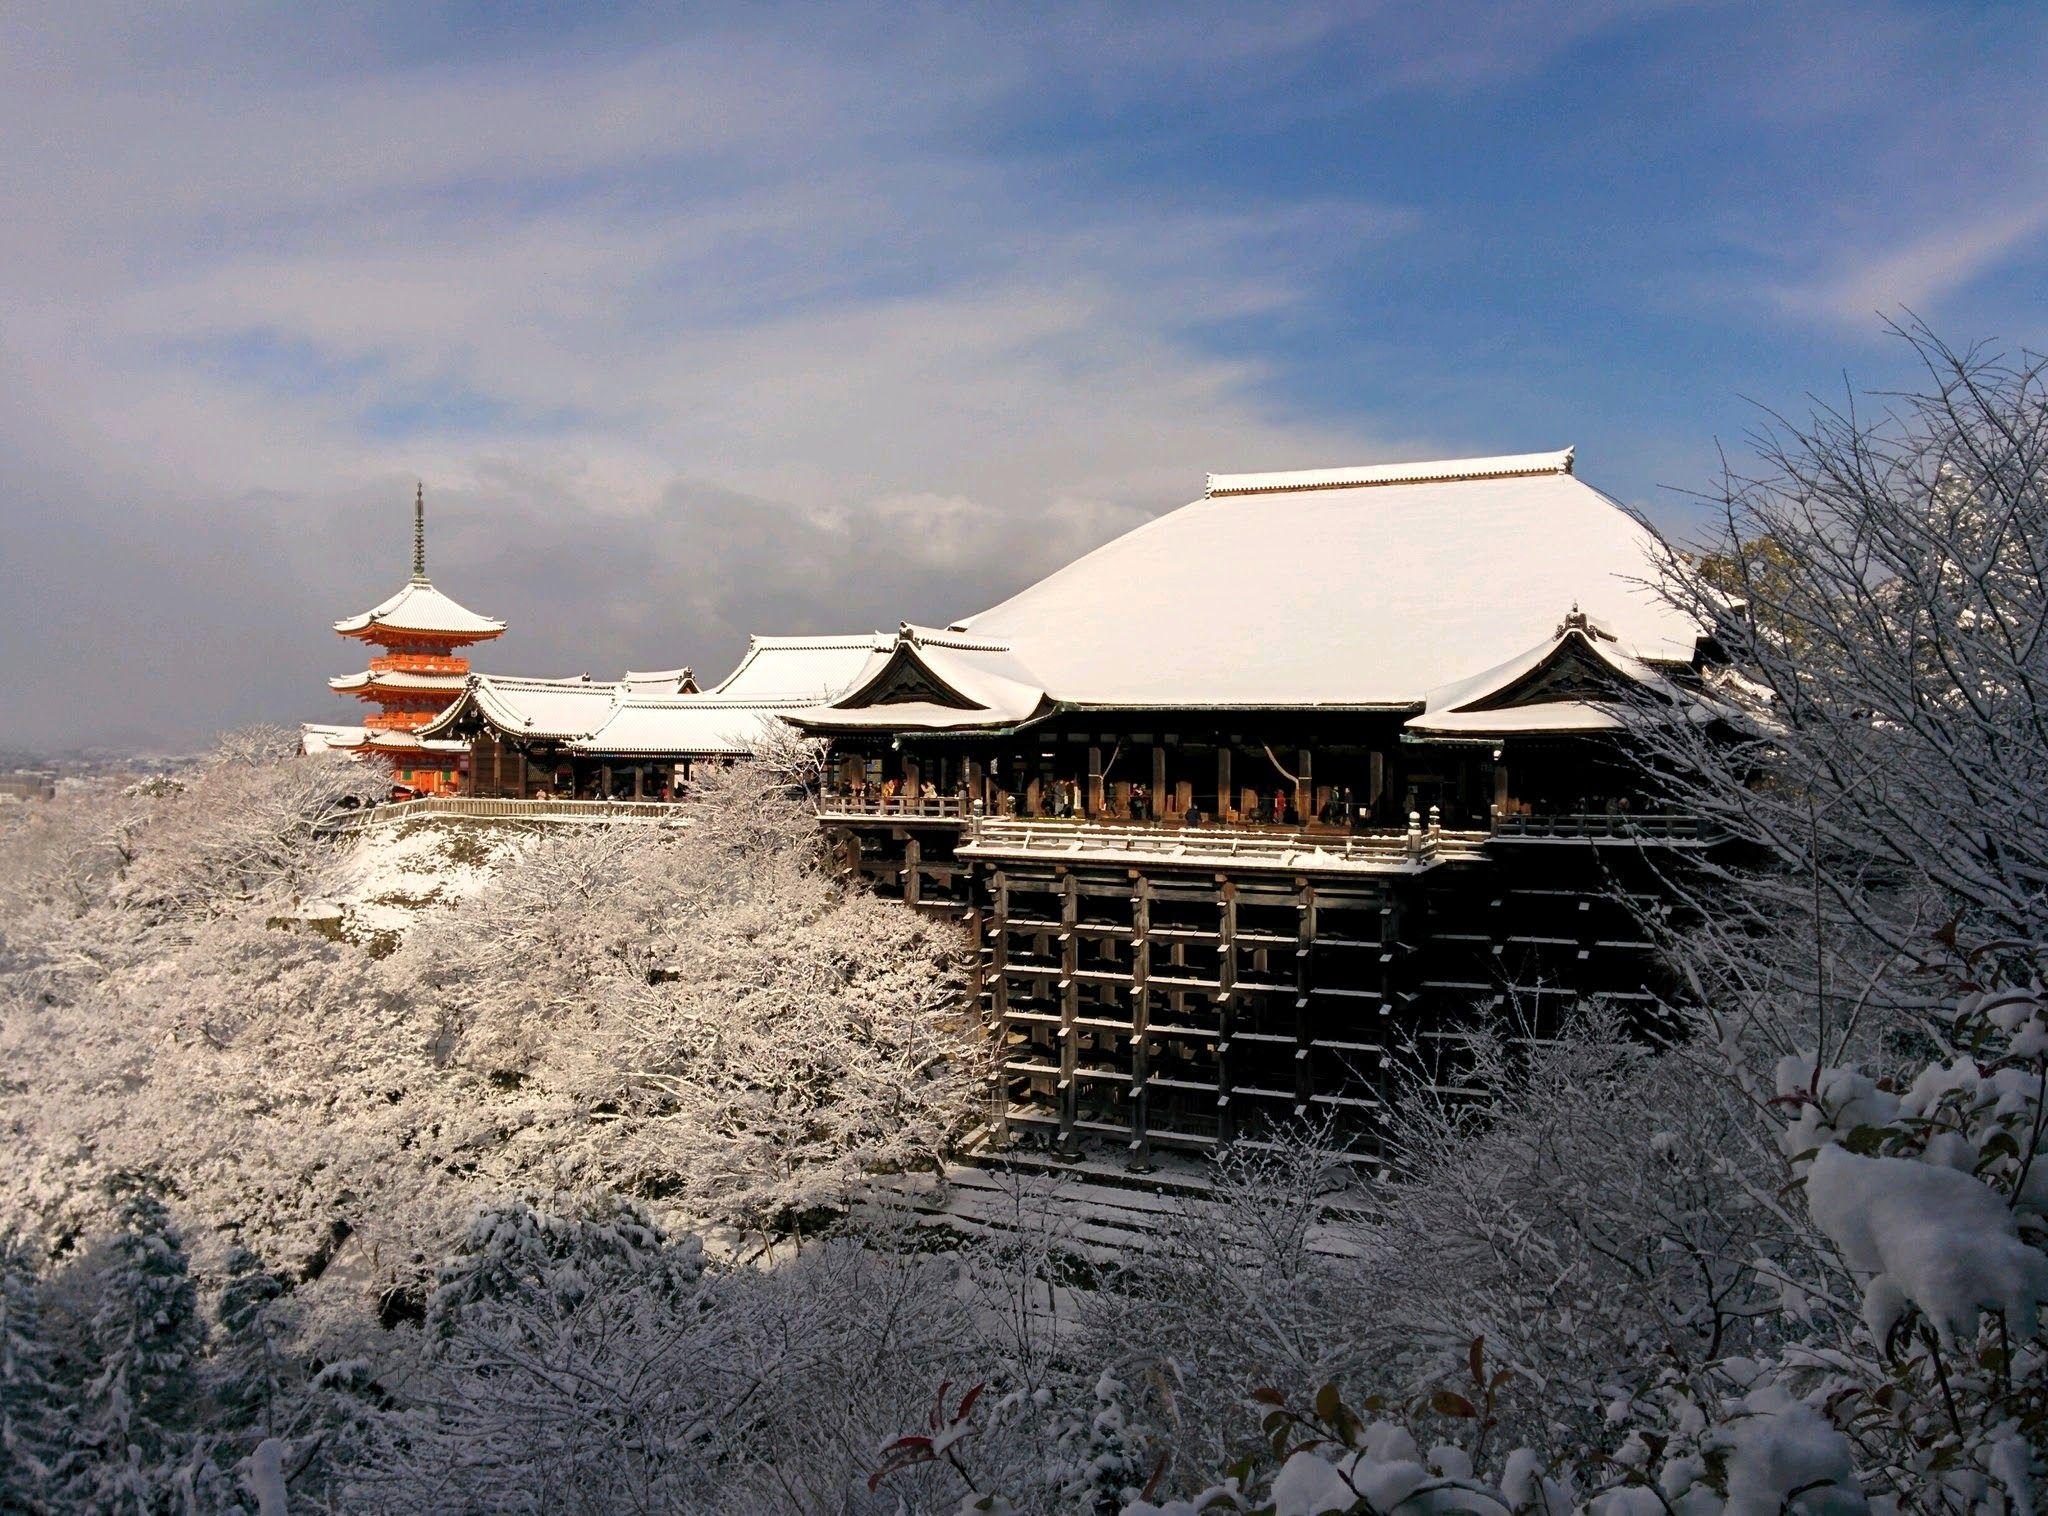 Kiyomizu temple in Kyoto Jan. 15, 2017.